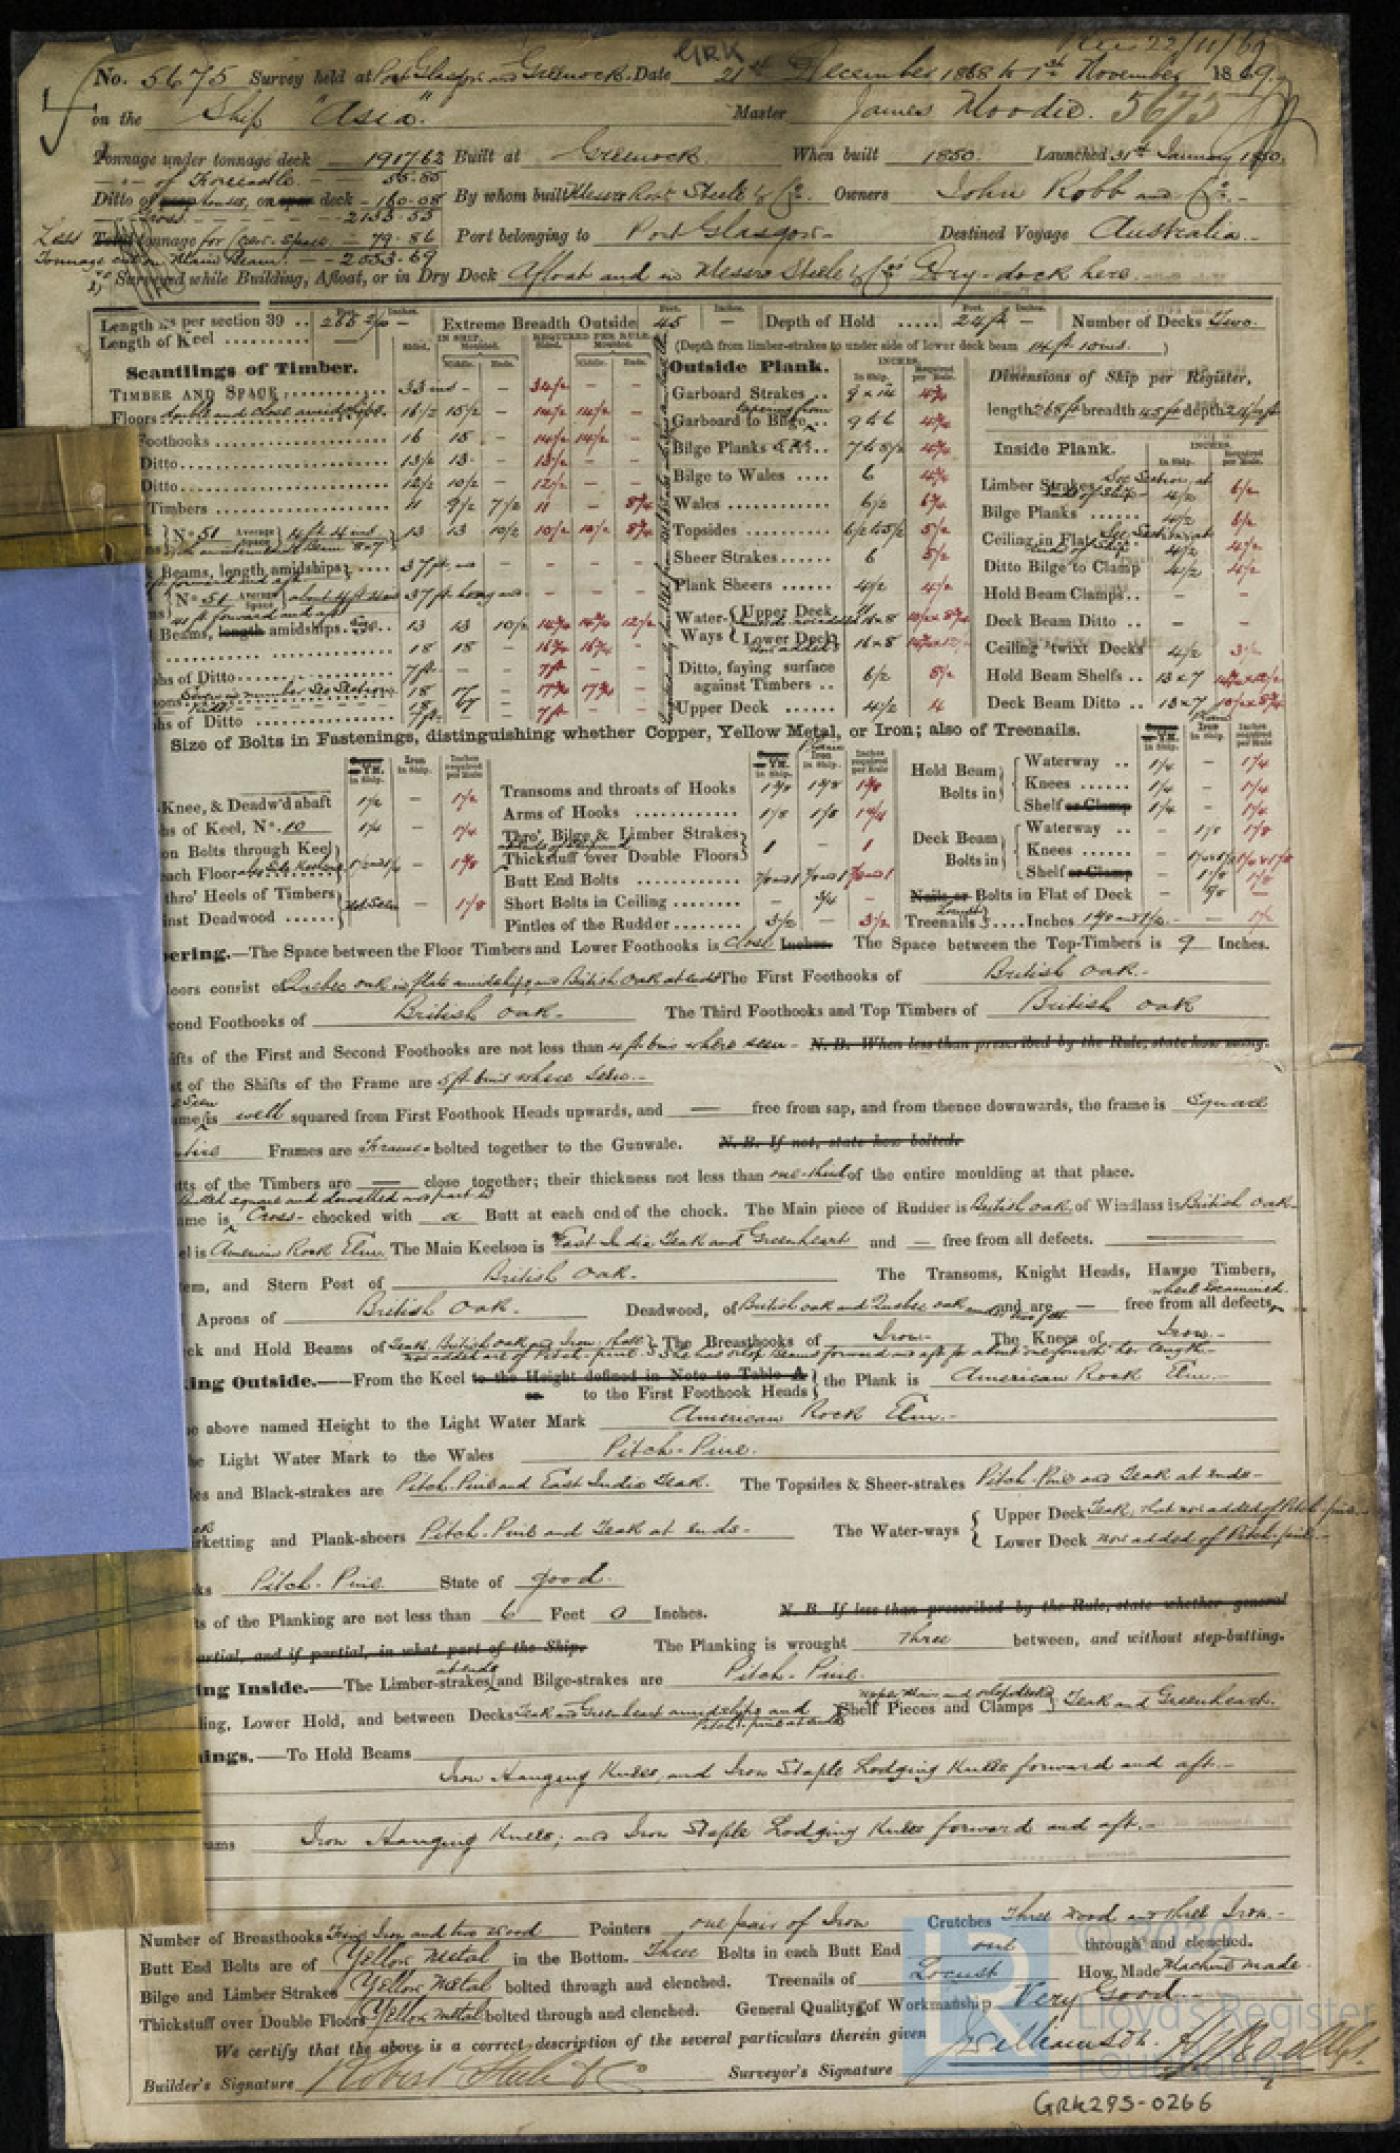 Survey Report for Asia, 1st November 1869